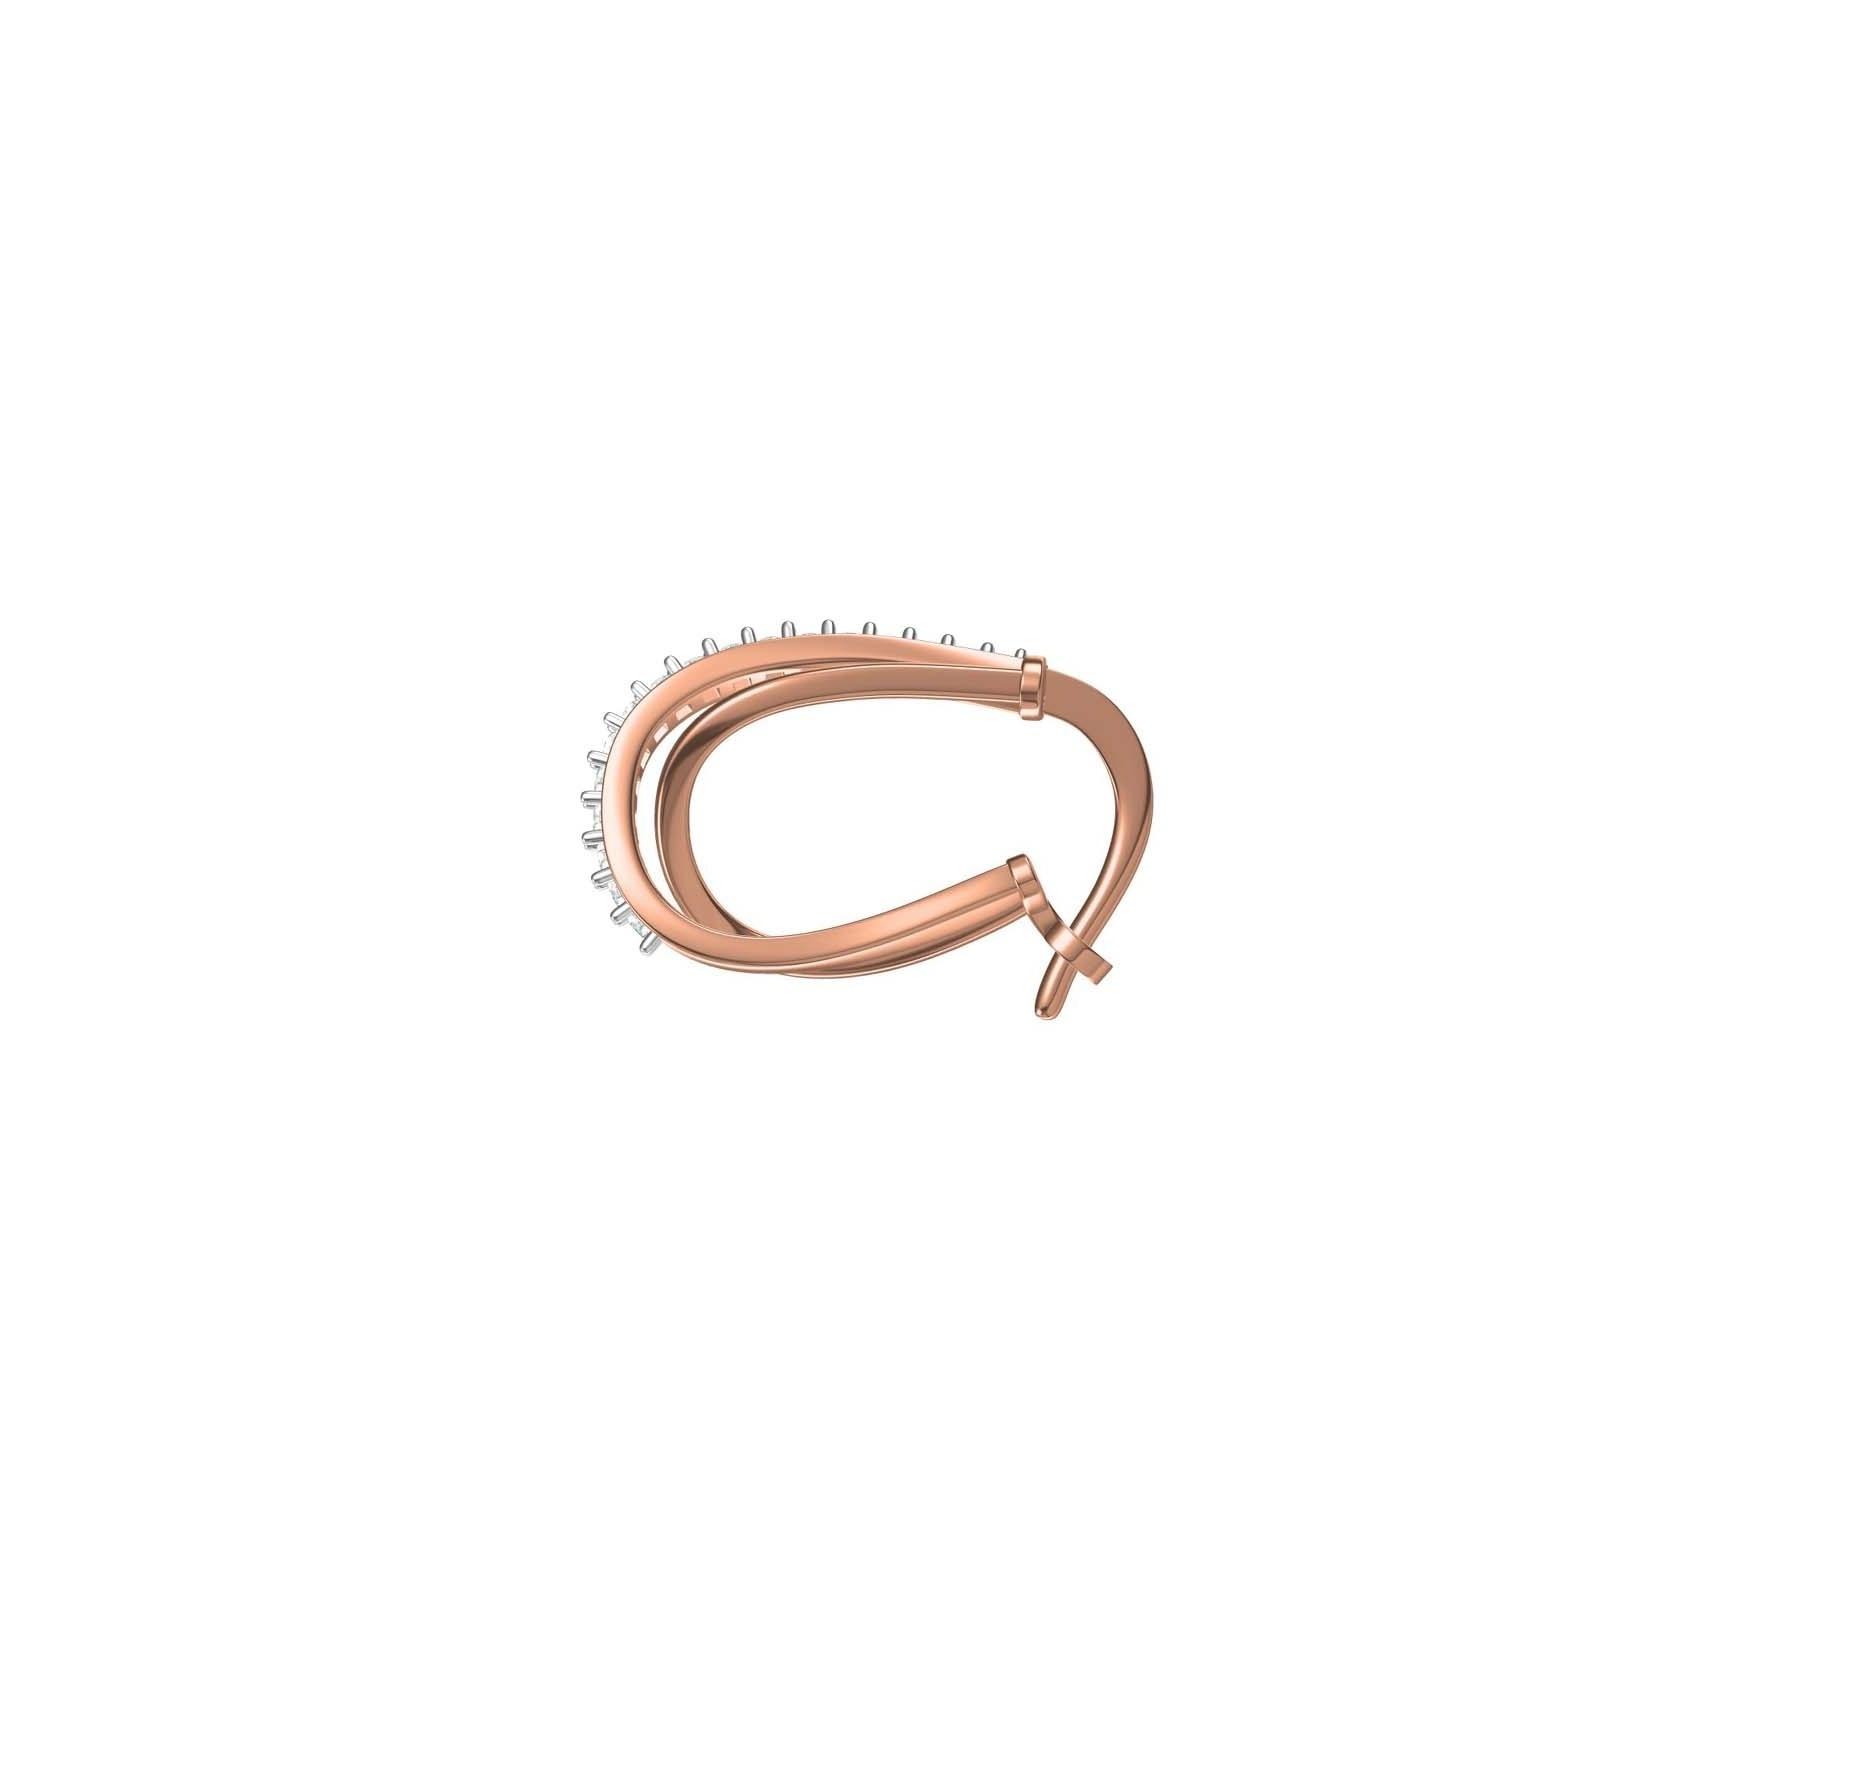 Diamond Earring TCW 0.425 14K gold 5.5 gm